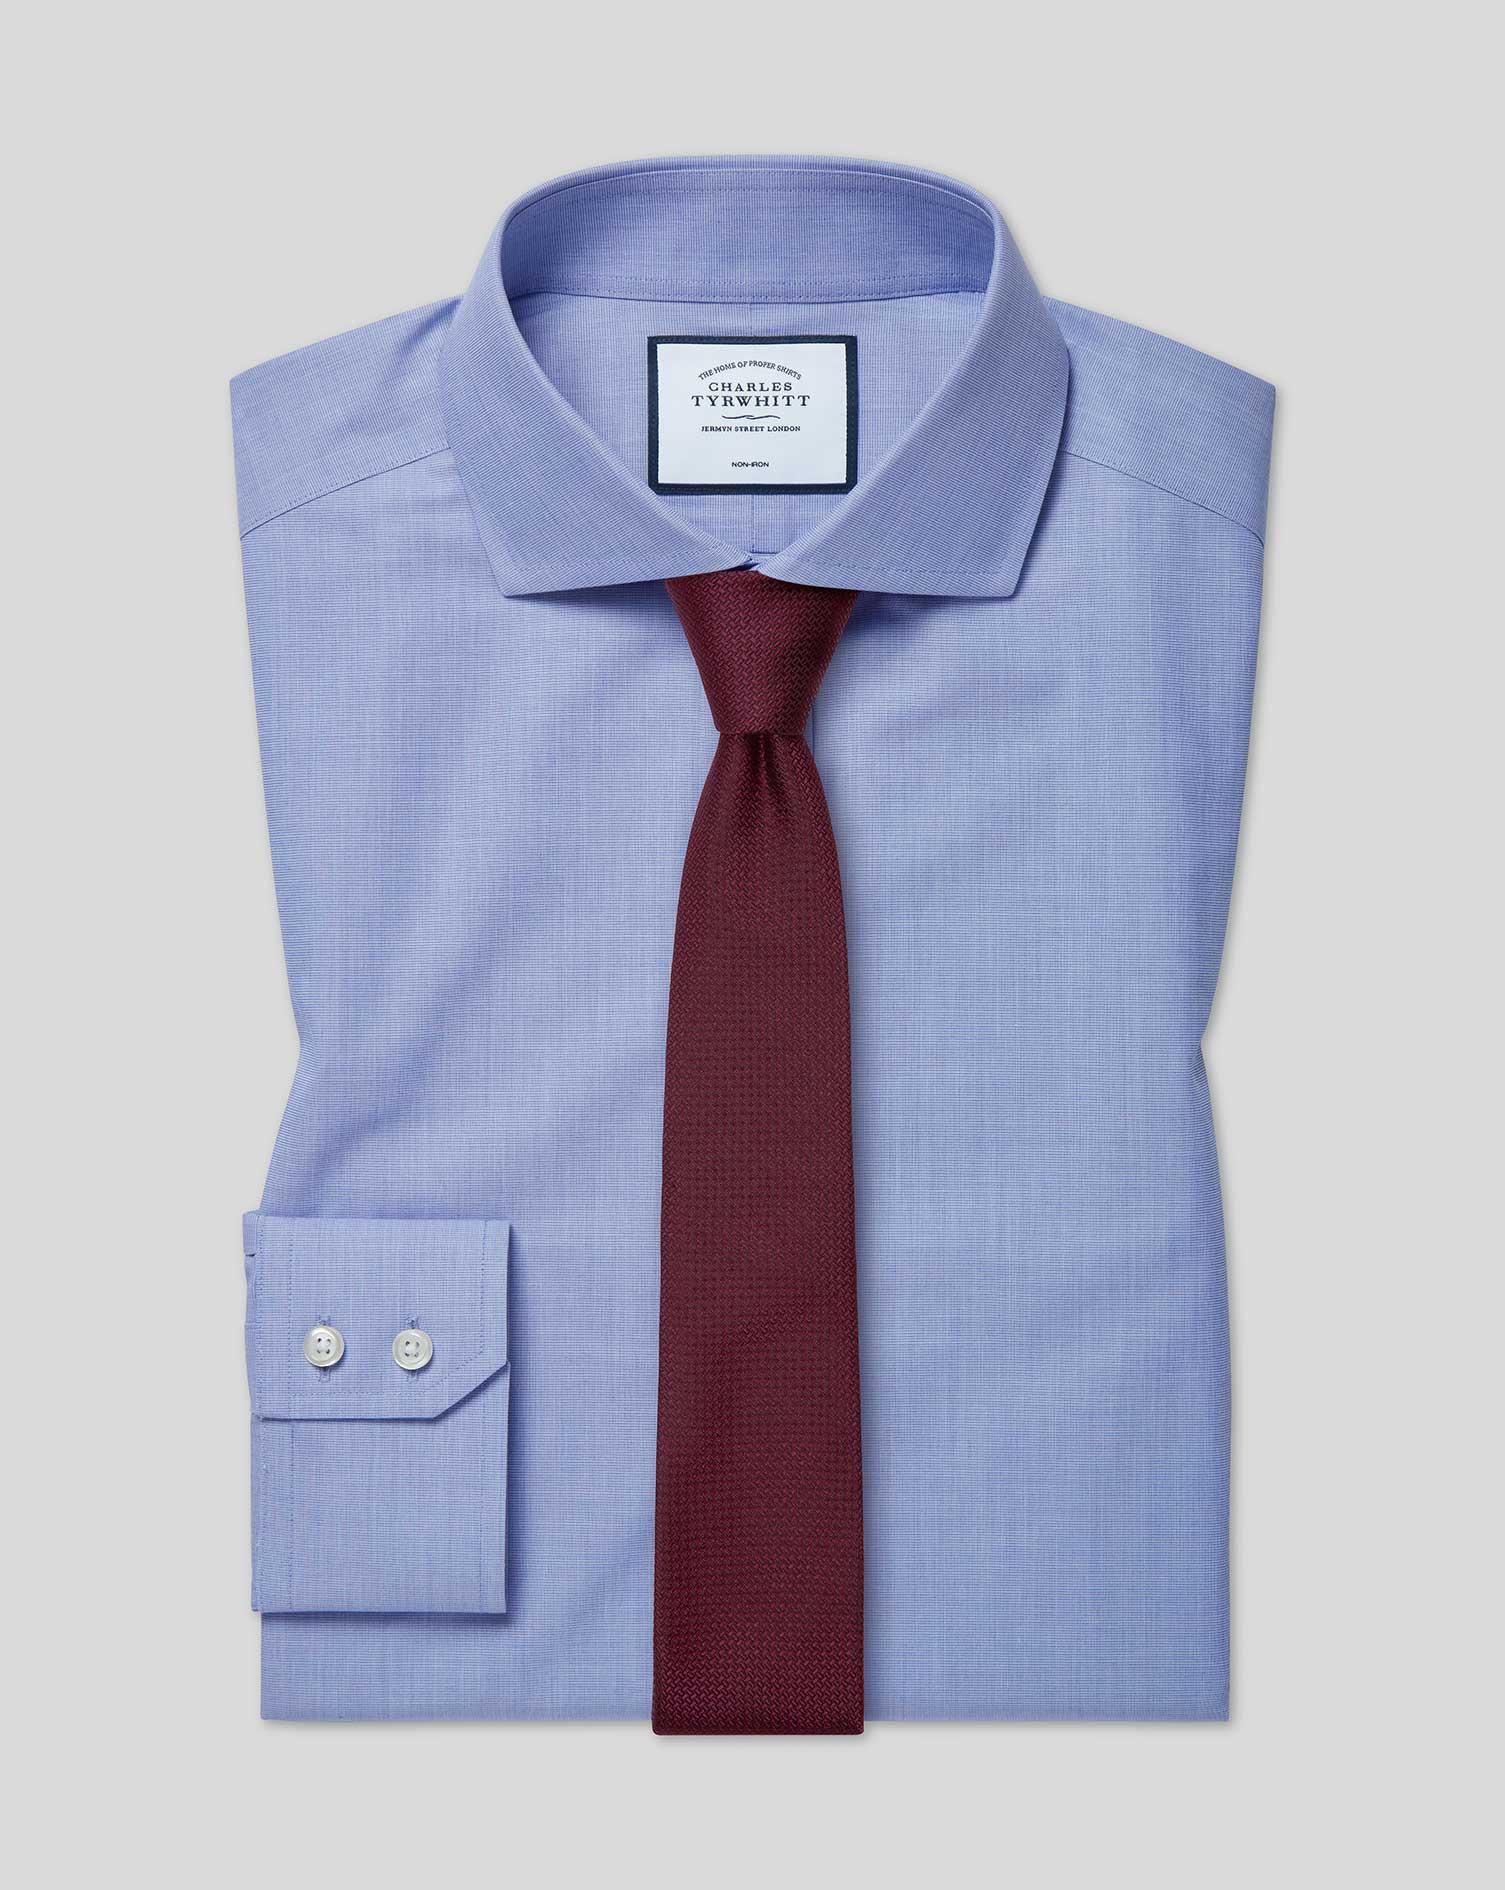 Cotton Extra Slim Fit Non-Iron 4-Way Stretch Blue Shirt